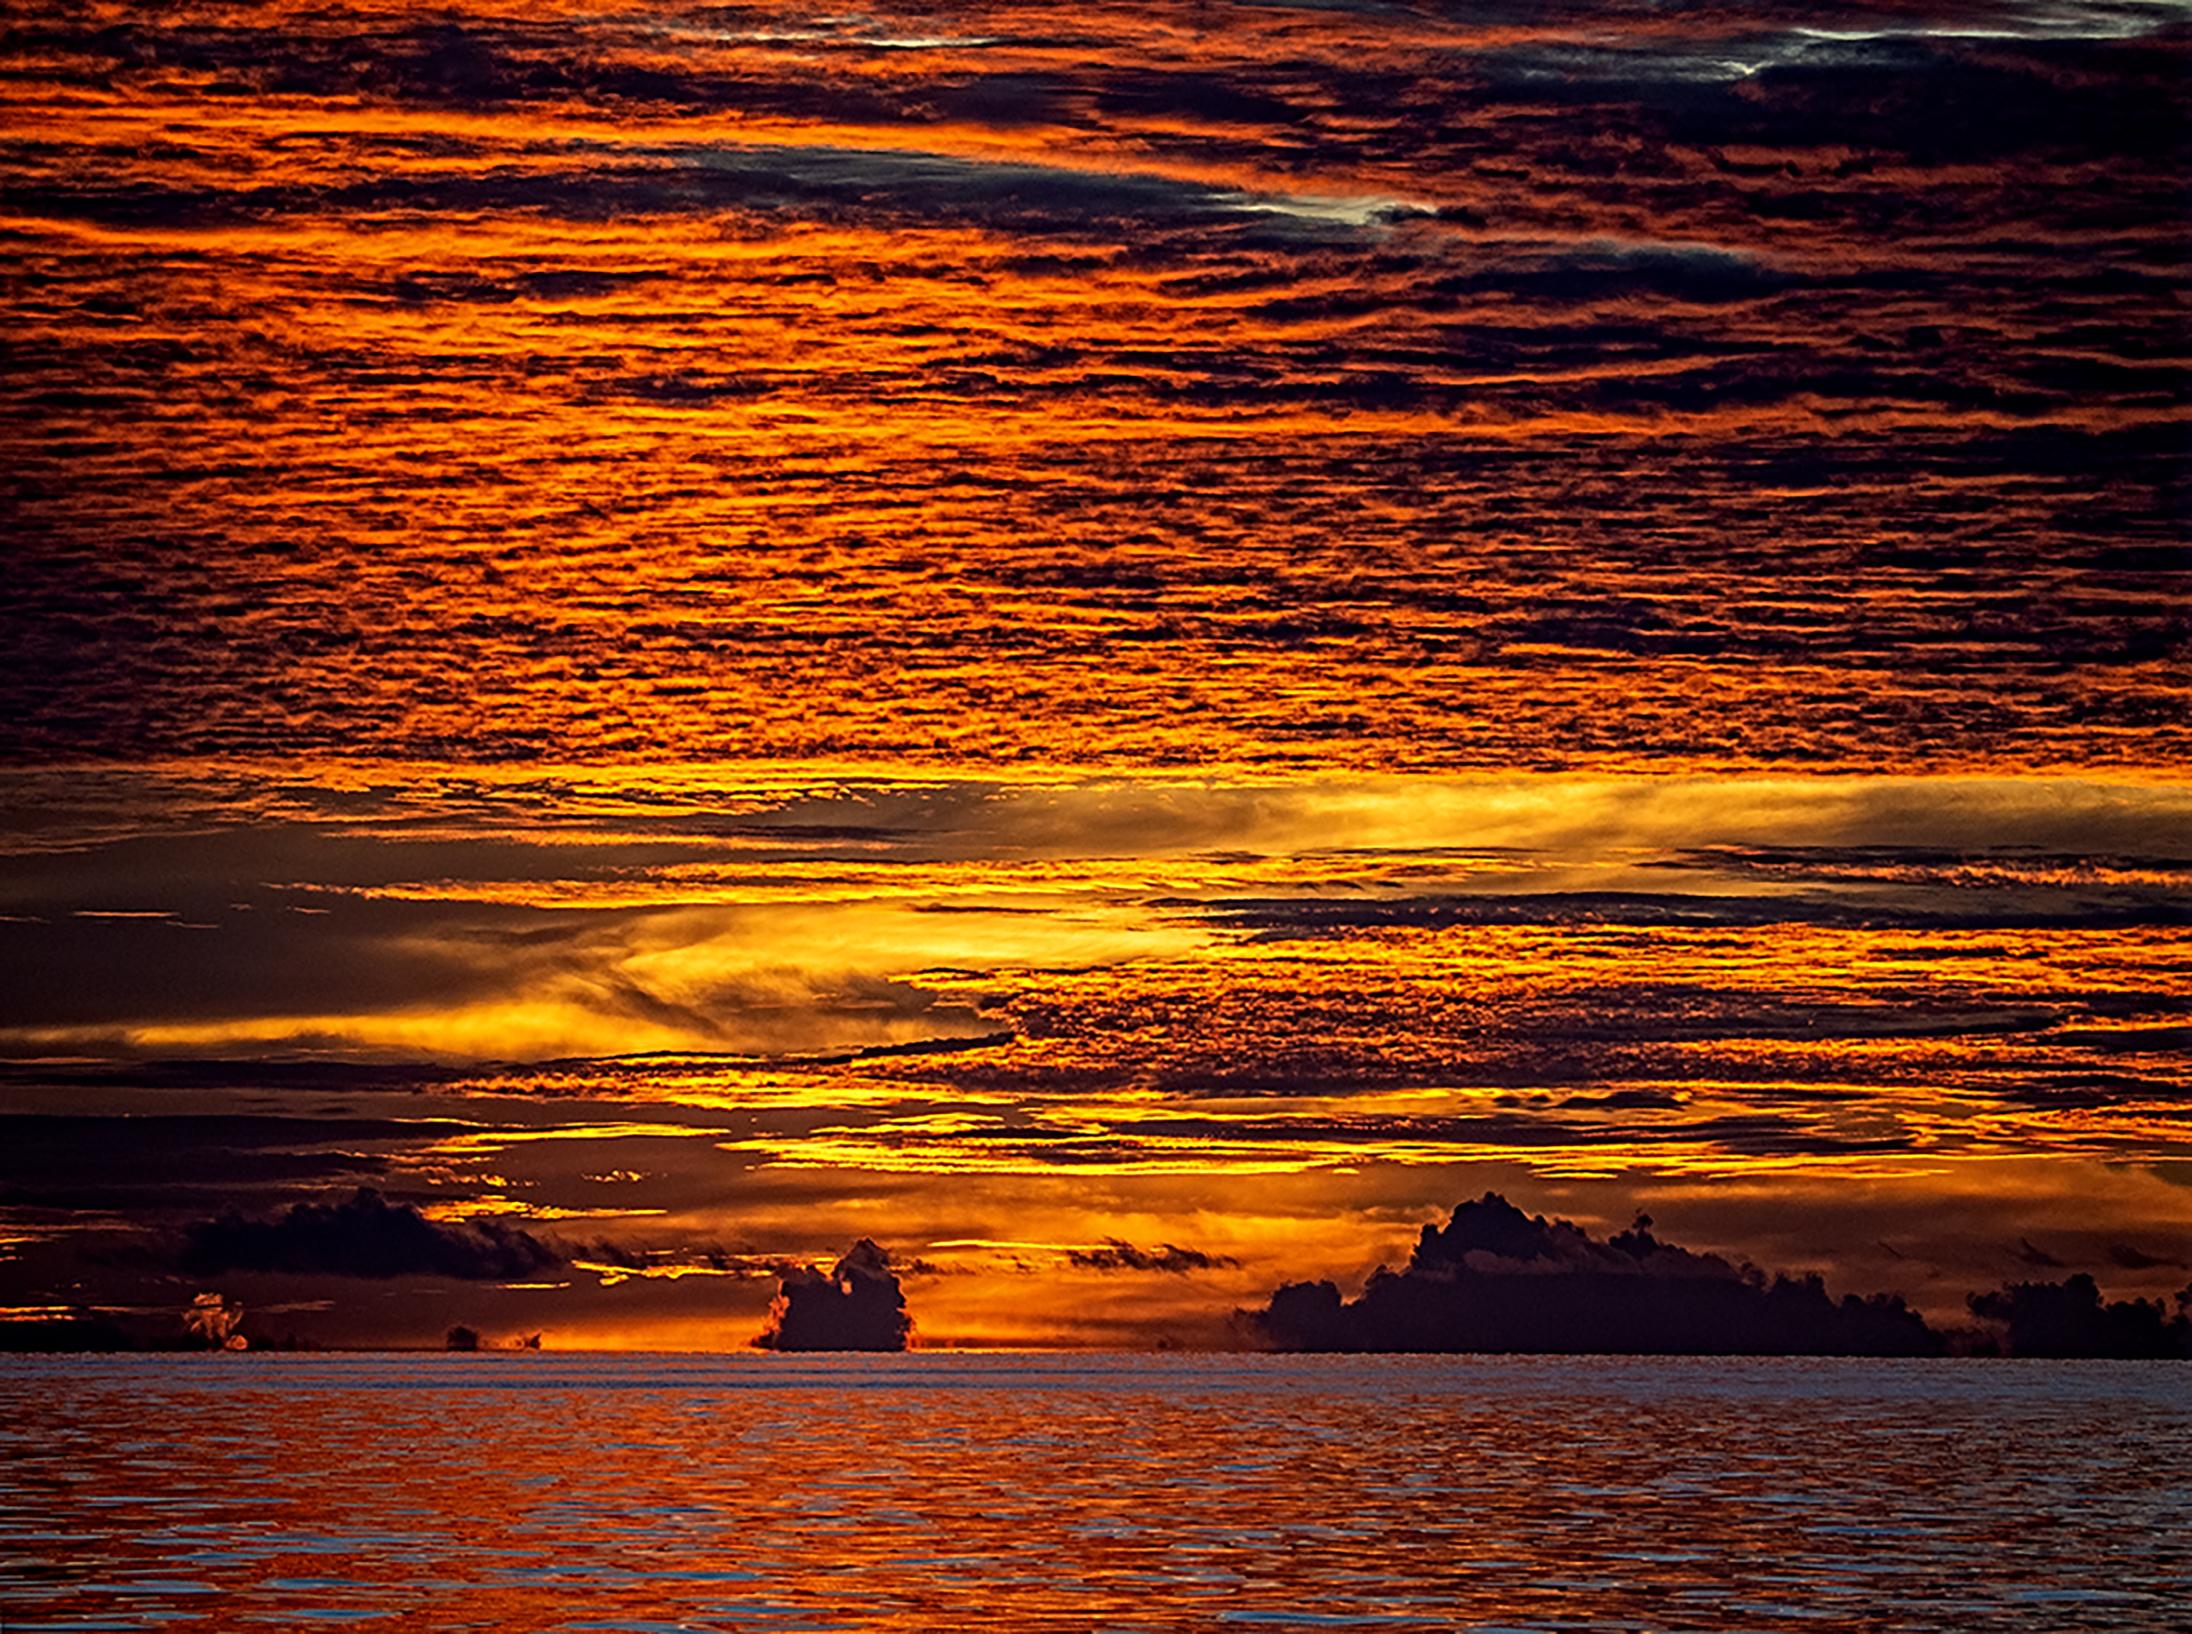 Sunset in Vilingili...